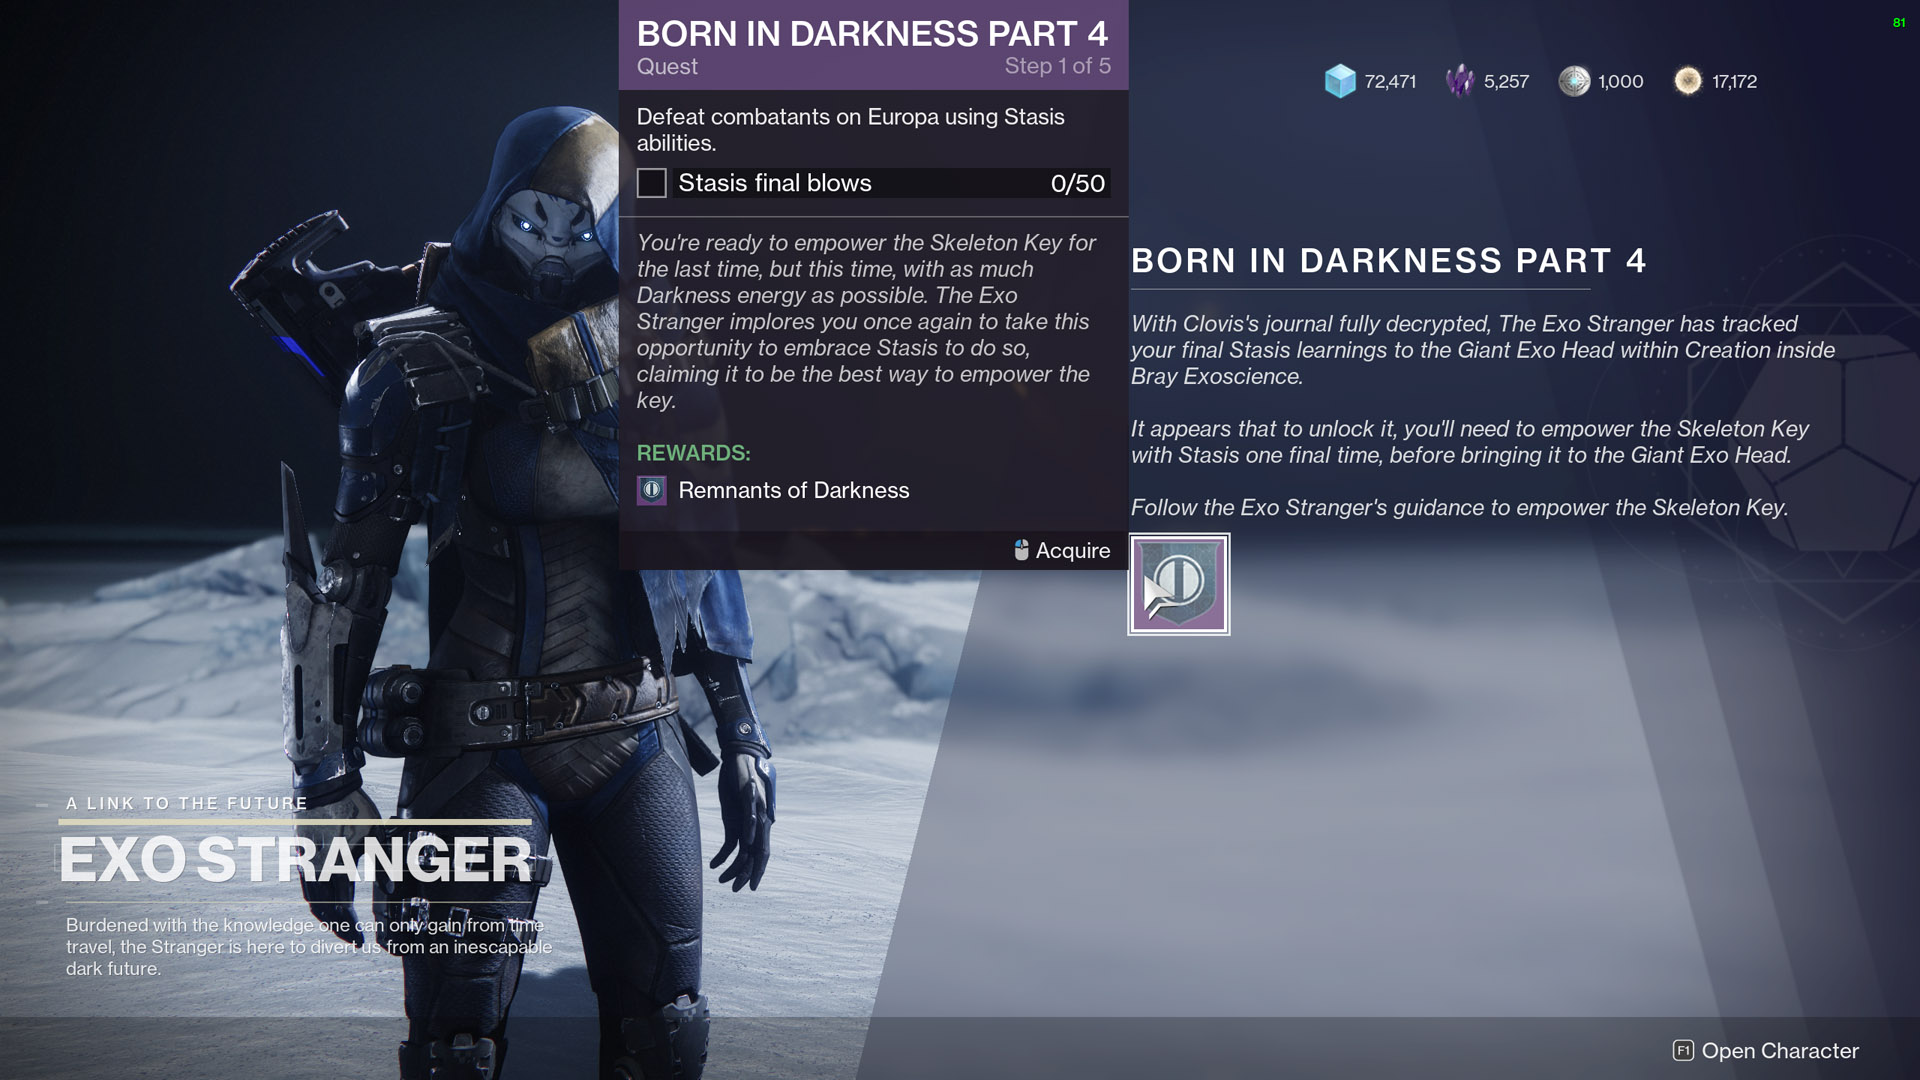 destiny 2 born in darkness part 4